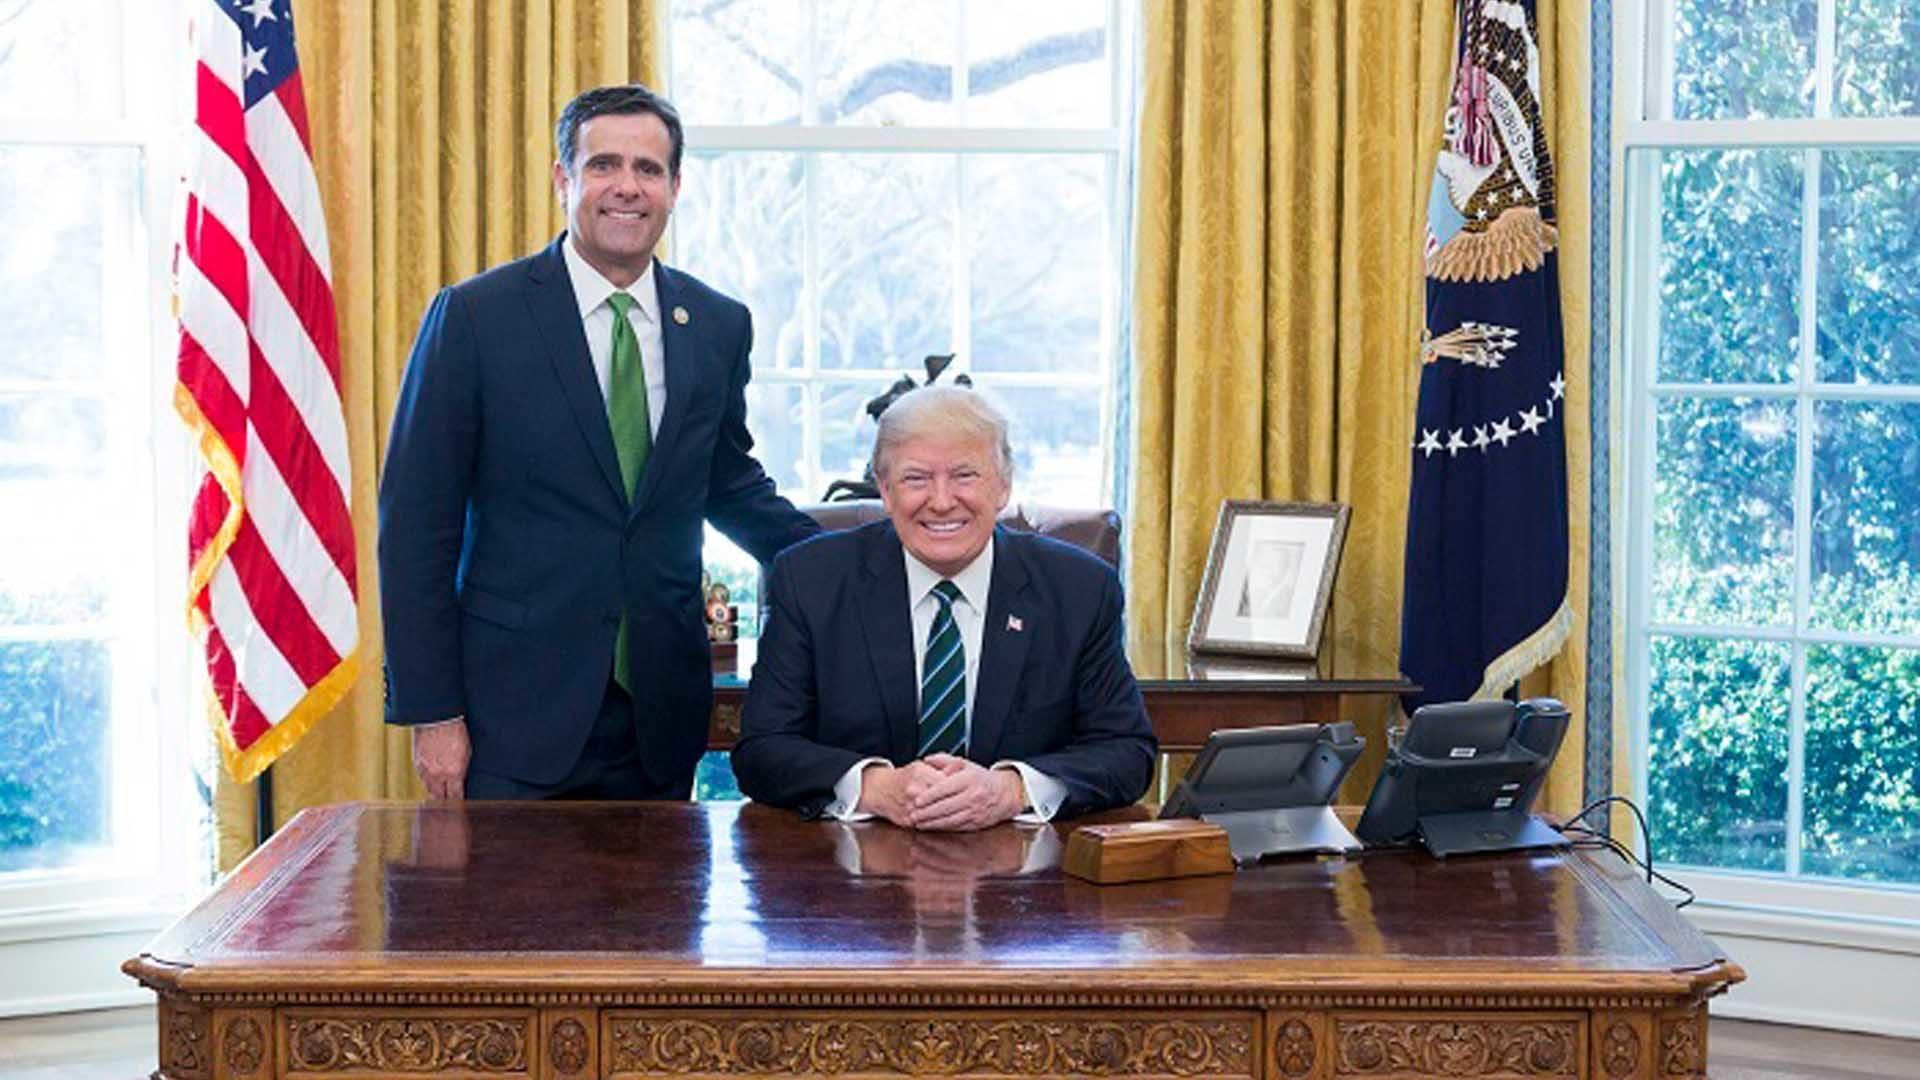 http://recentr.com/wp-content/uploads/2019/07/Donald_Trump_and_John_Ratcliffe-1920-1920x1080.jpg